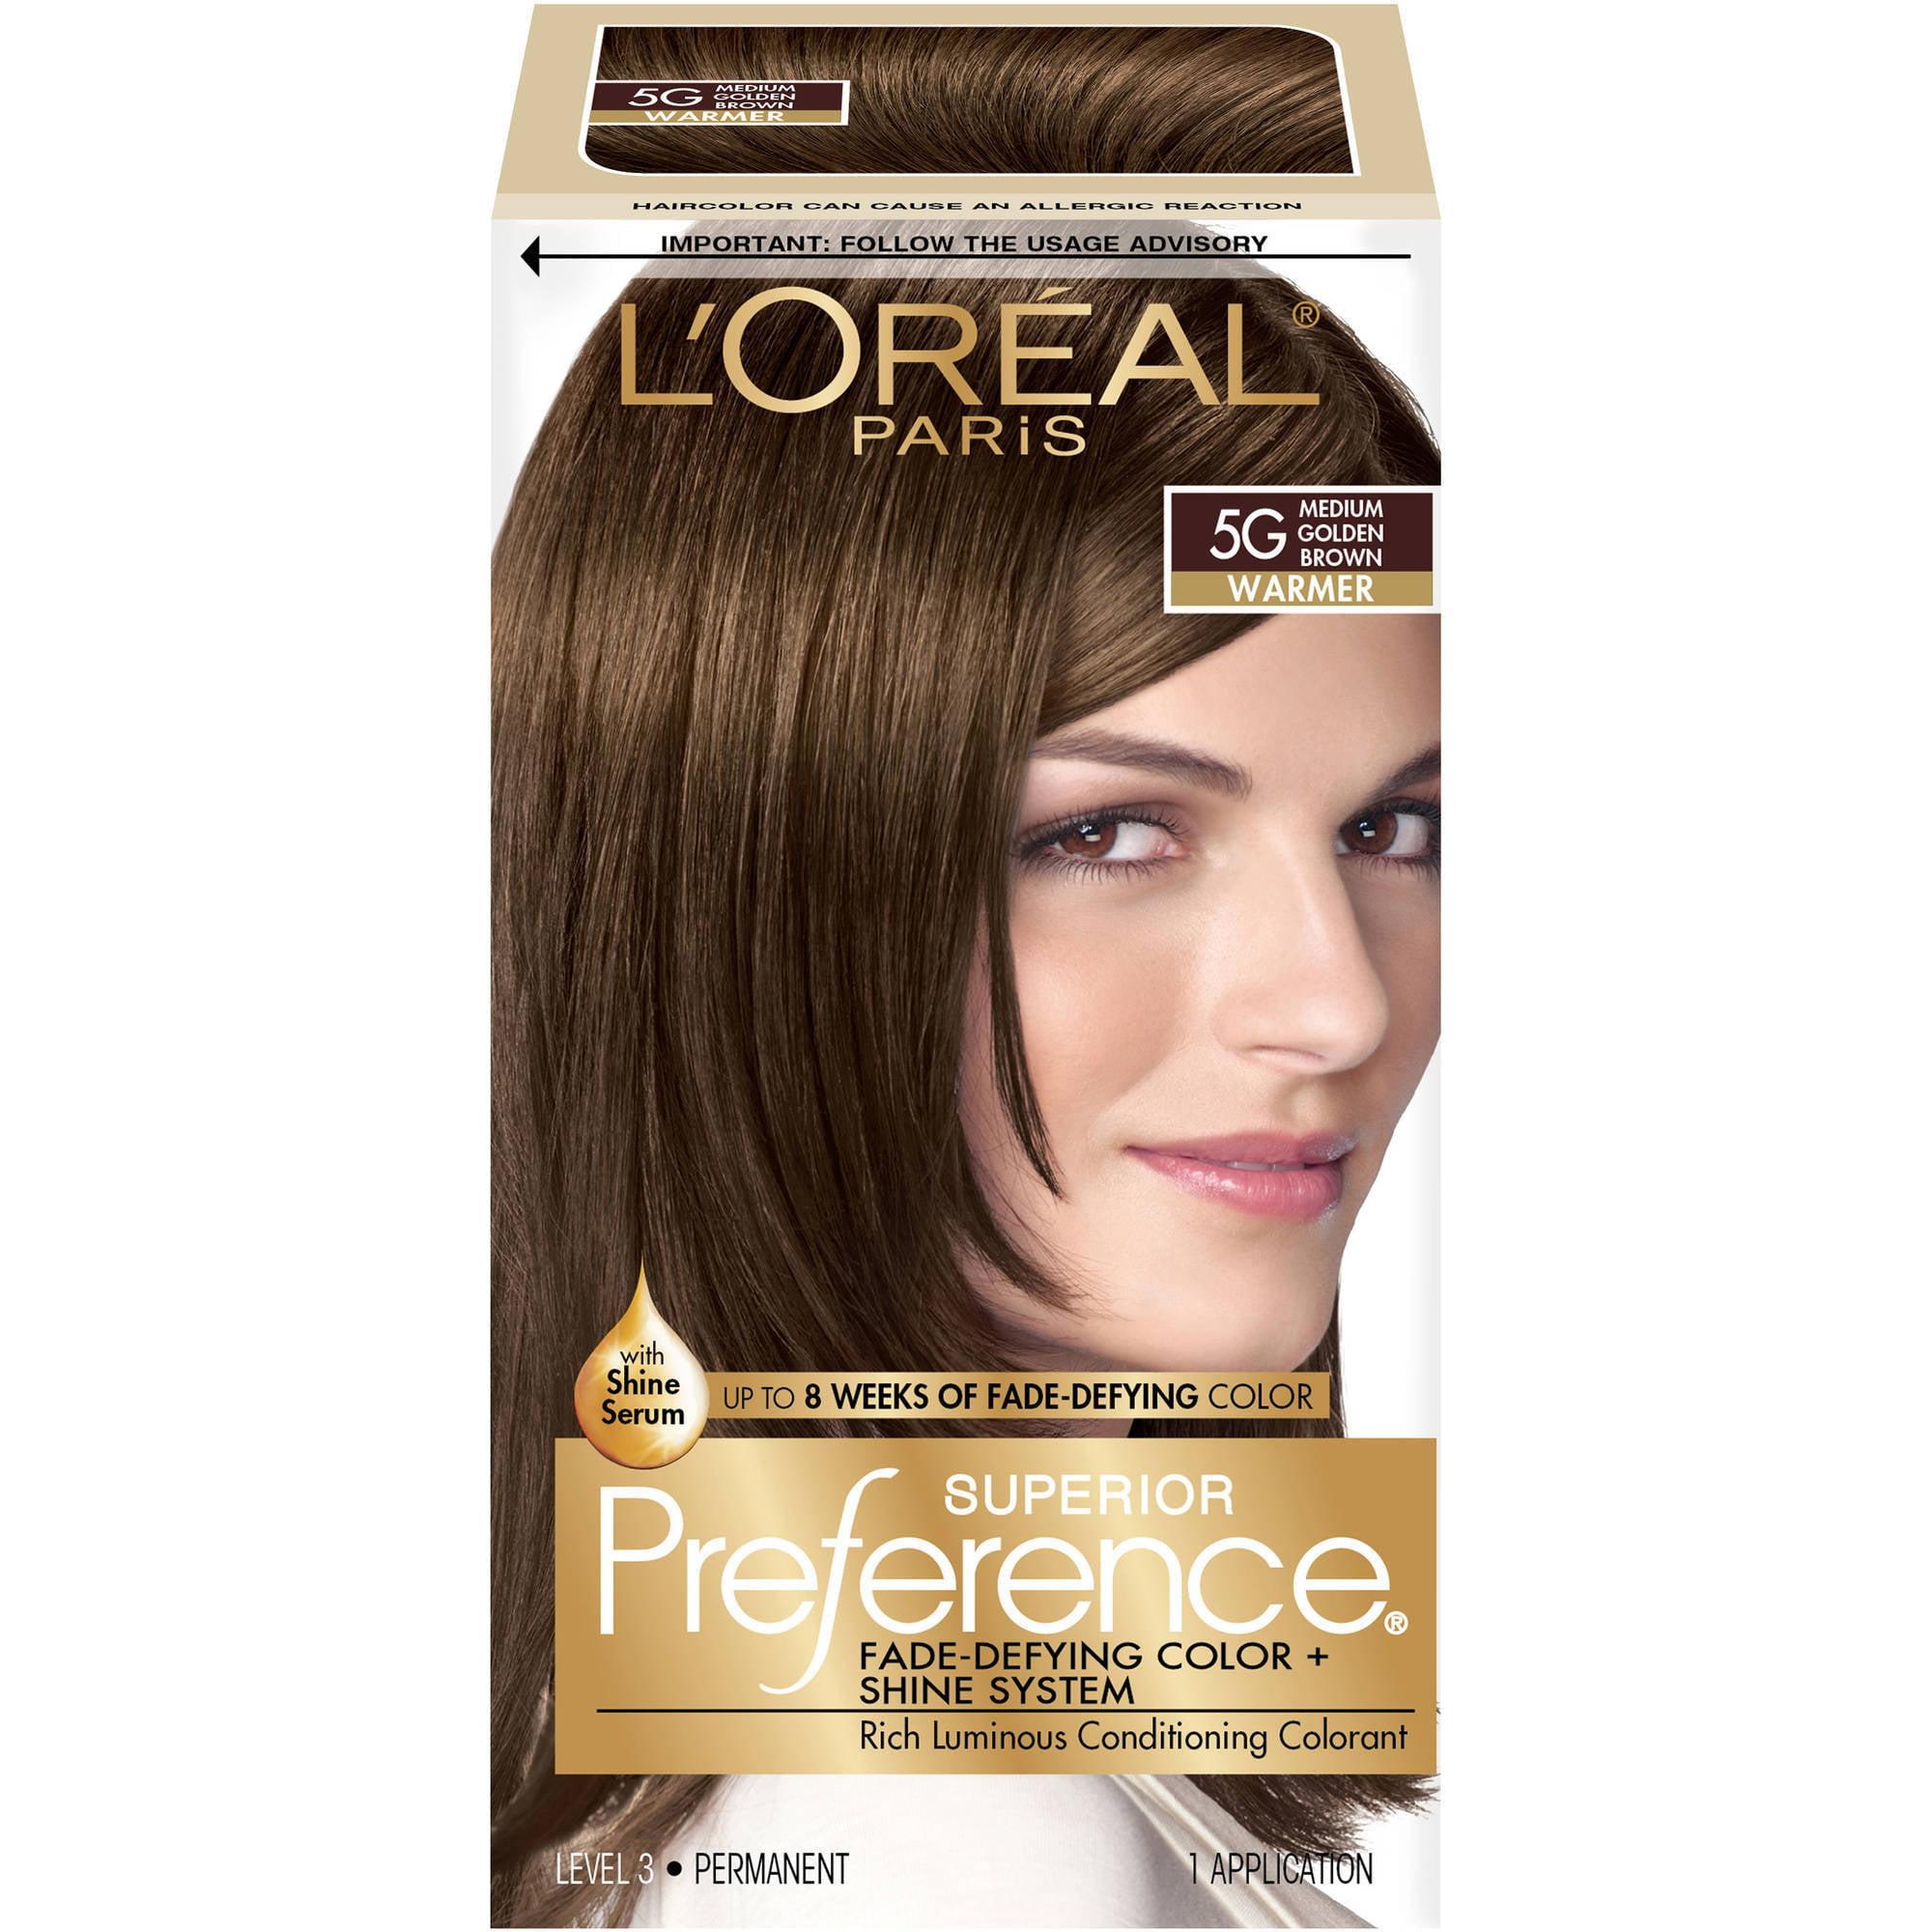 L'Oreal Paris Superior Preference Hair Color